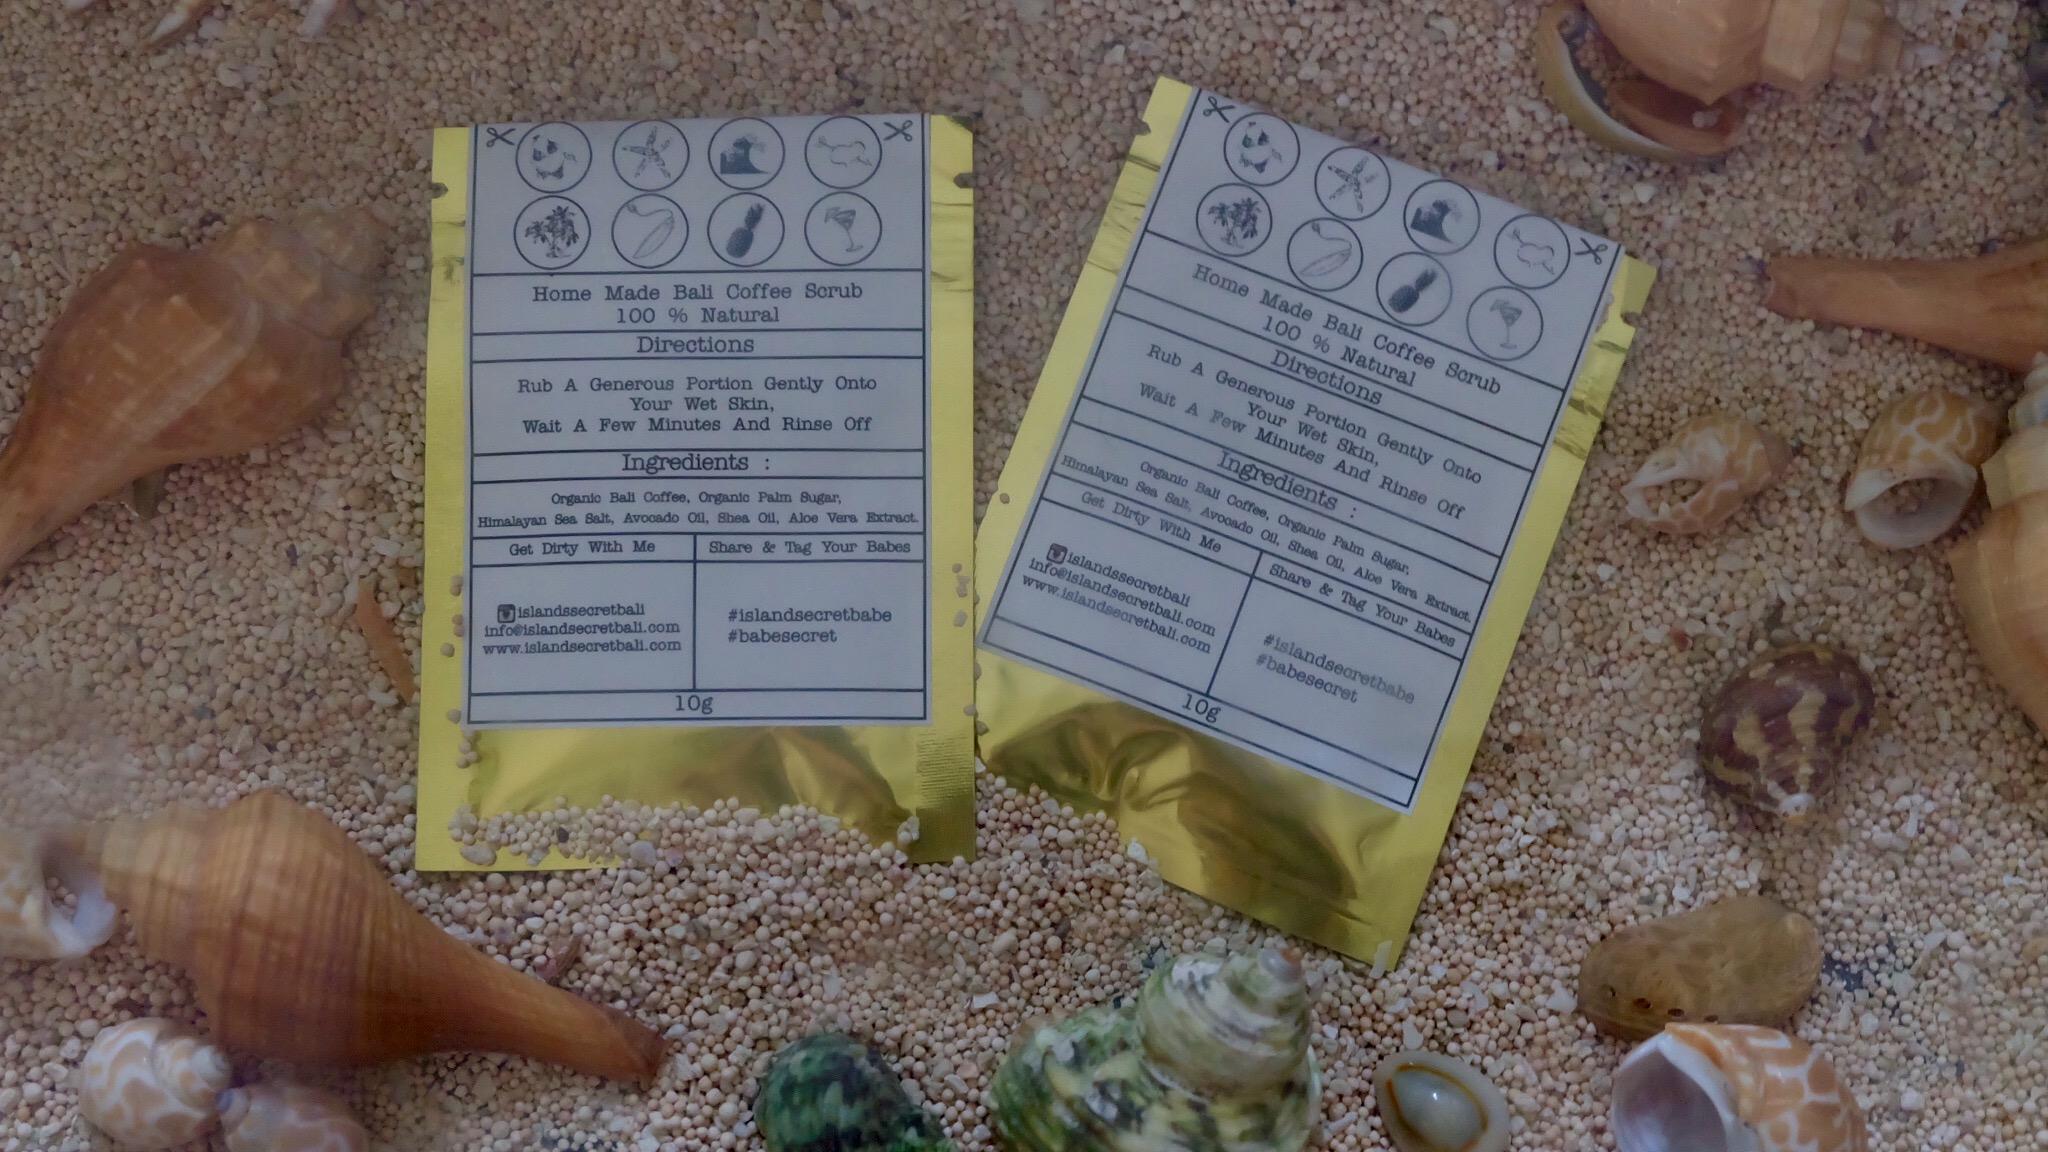 Review: Island Secret Bali Face and Body Scrub